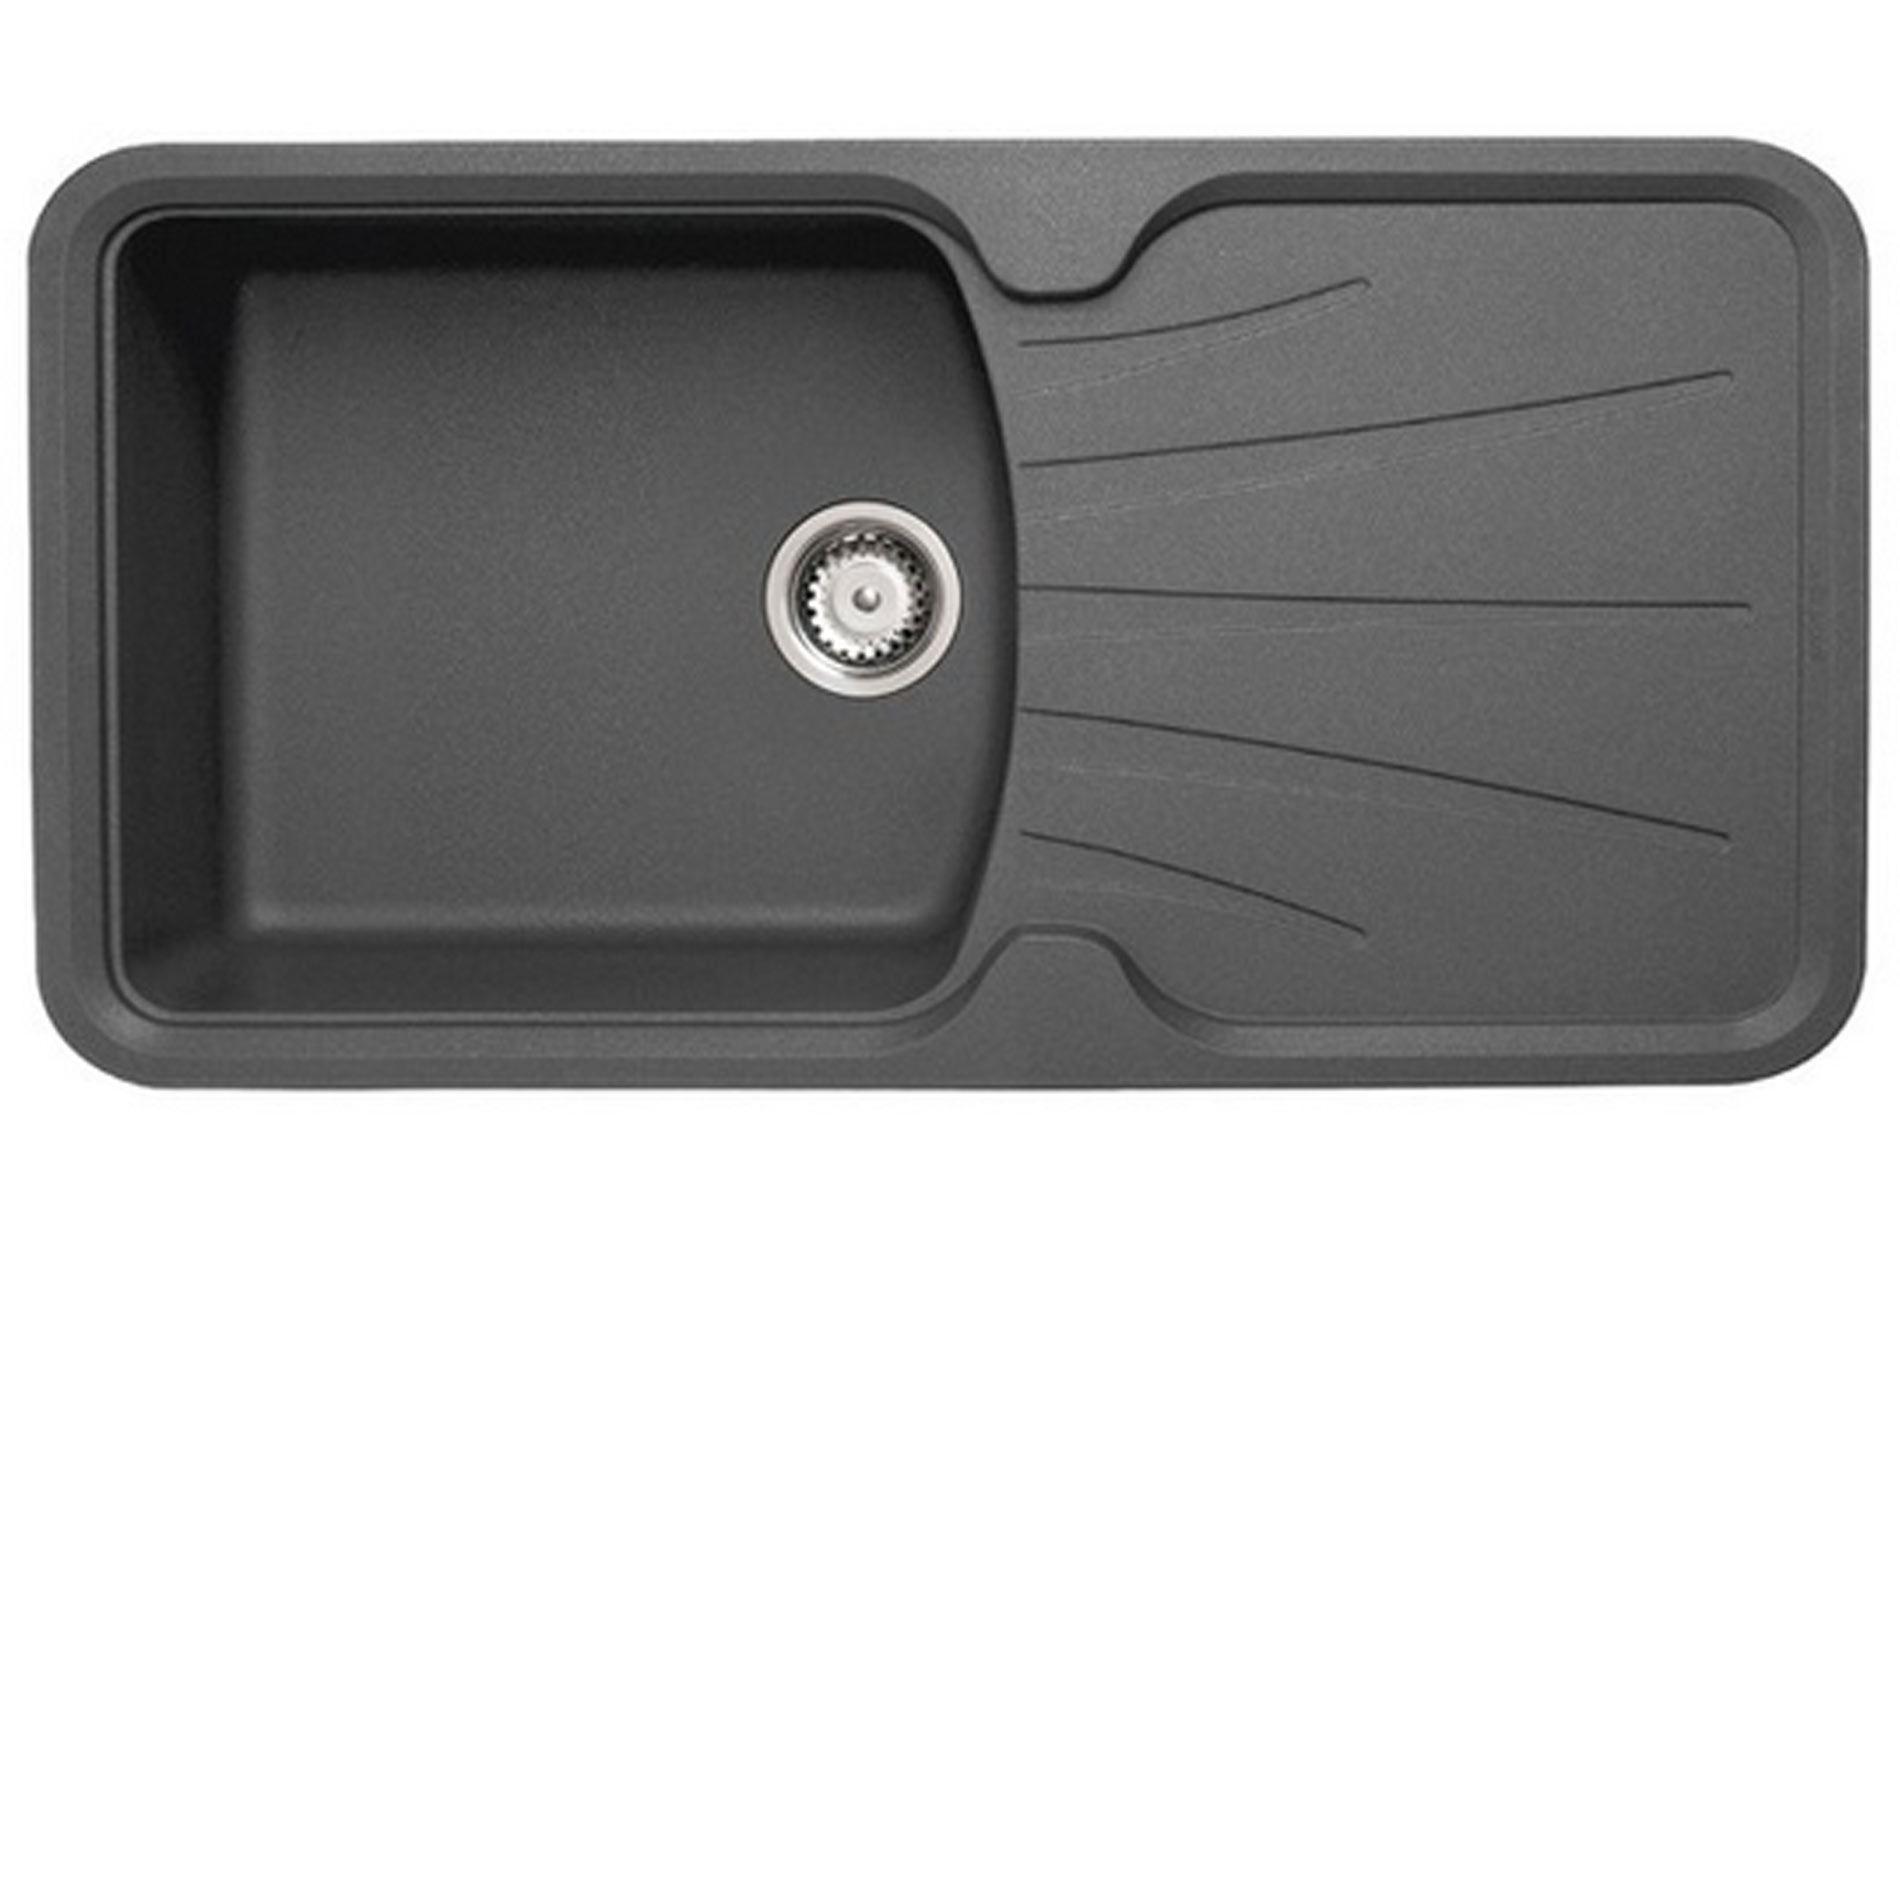 Graphite Kitchen Sinks CDA KG74GR 15 Bowl GraniteQuartz Composite ...